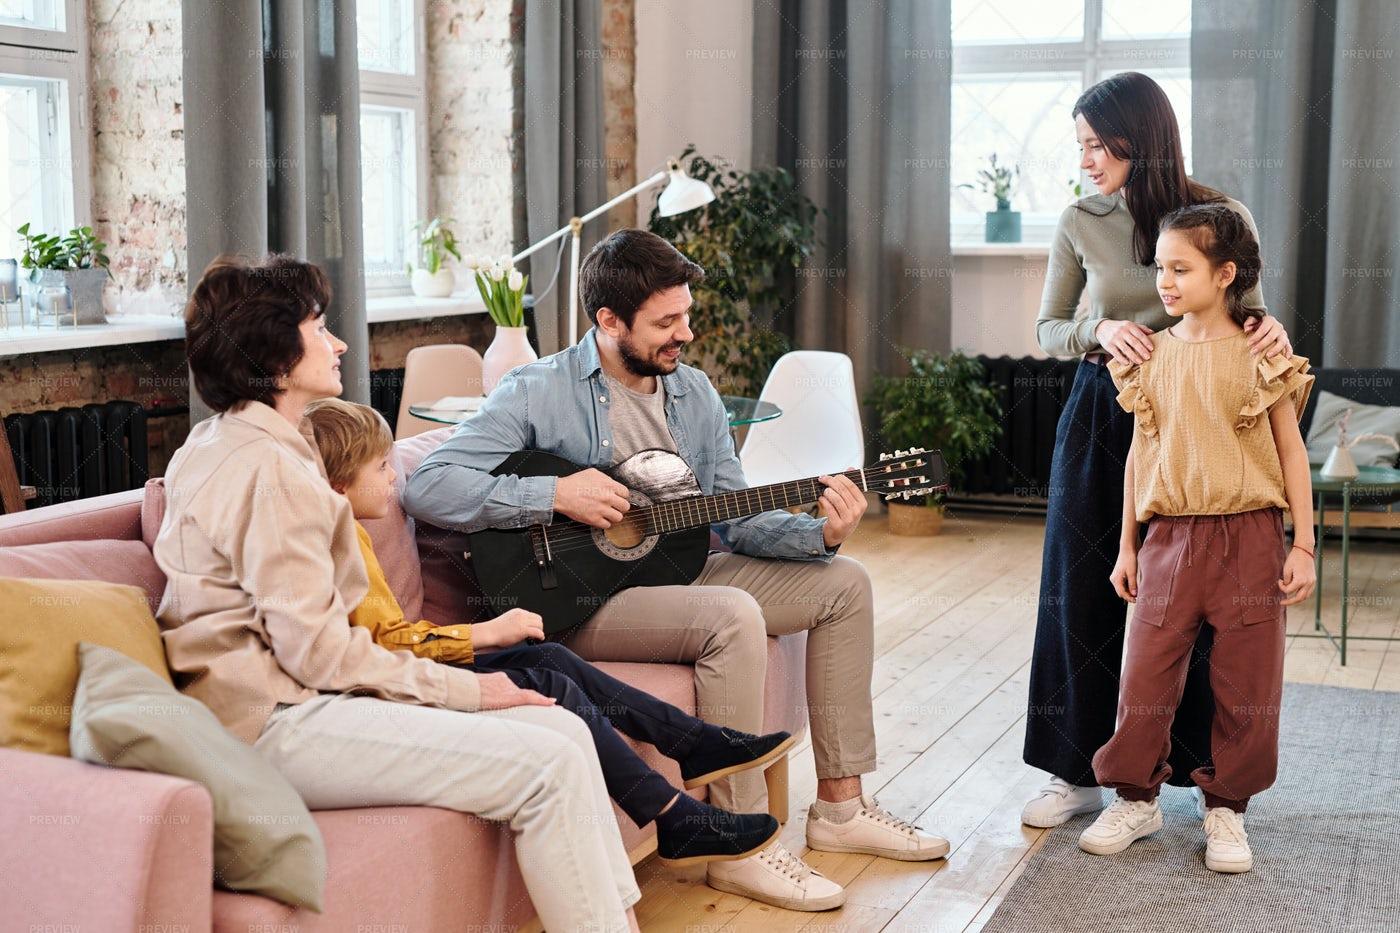 Man Playing Guitar To Family Members: Stock Photos